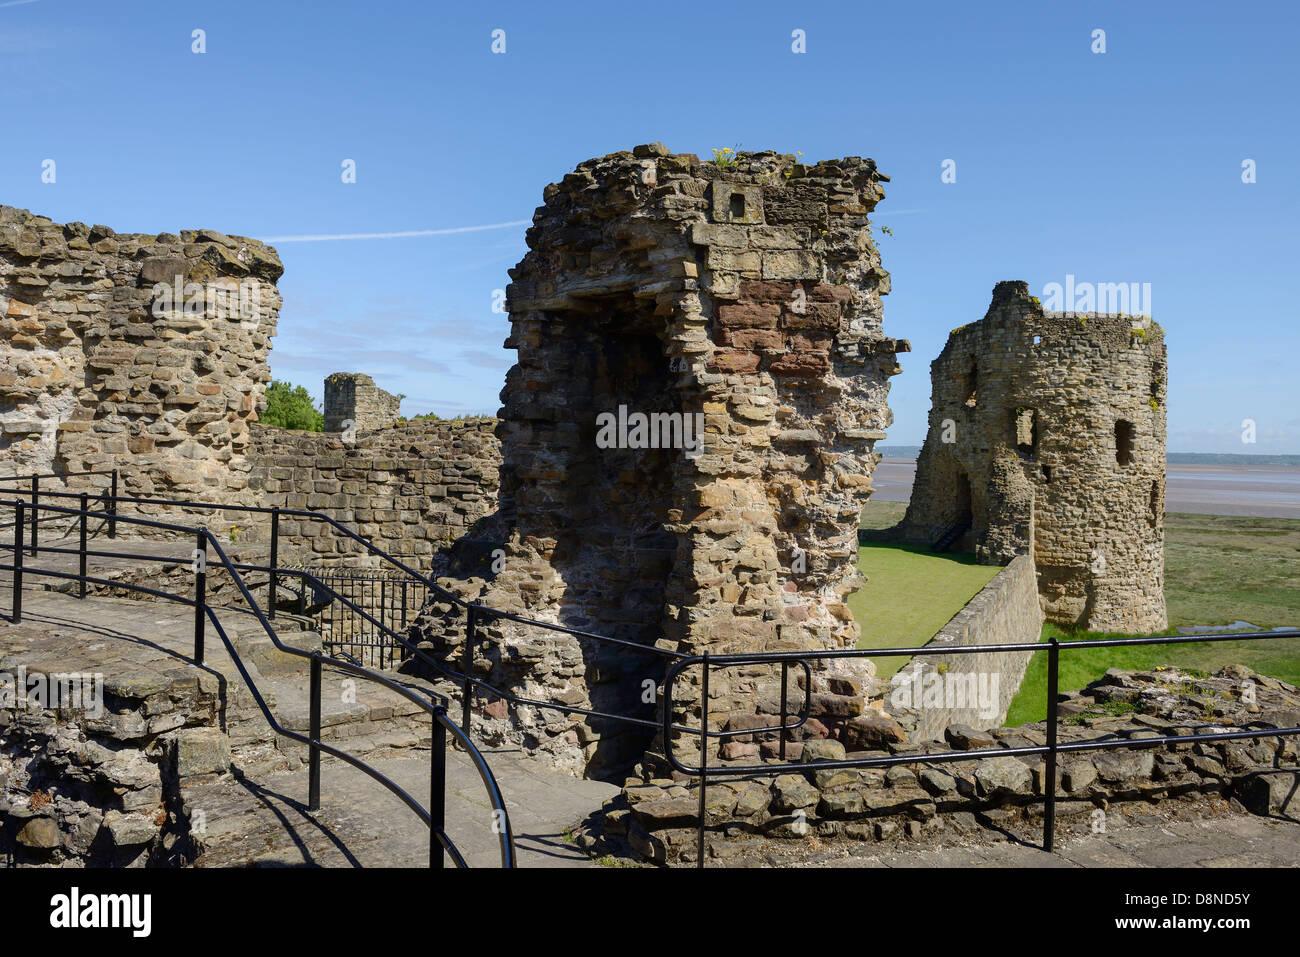 Flint Castle North East Wales UK - Stock Image